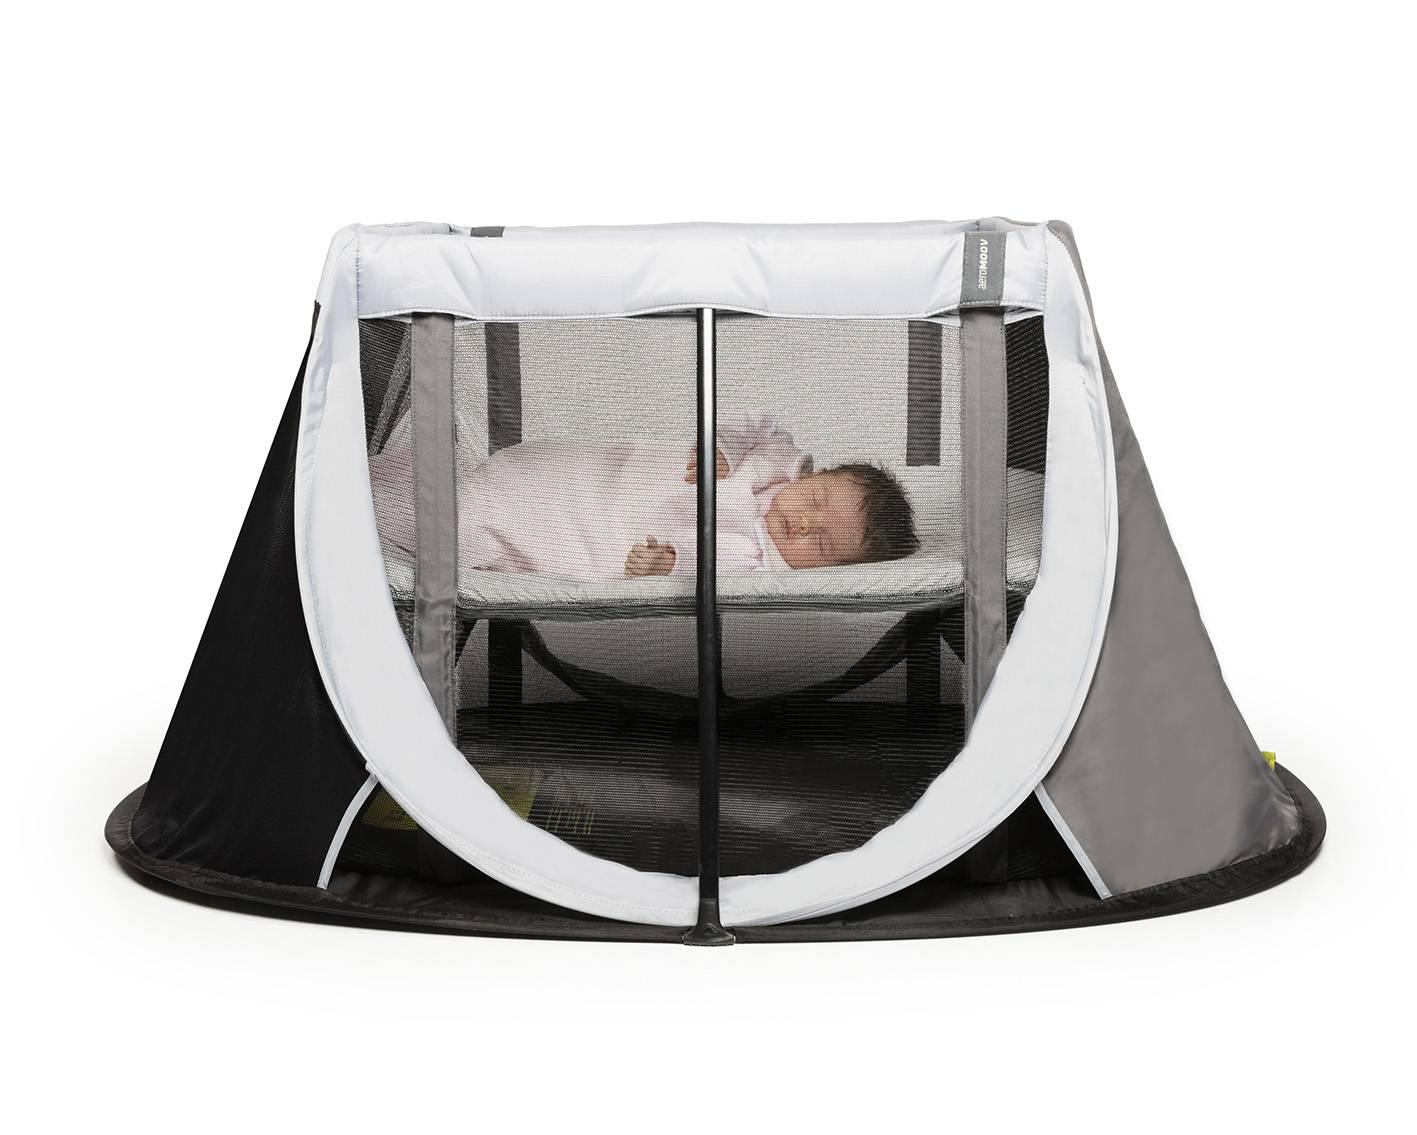 AEROMOOV-ATC11060-GR-front-bassinet-child-Small